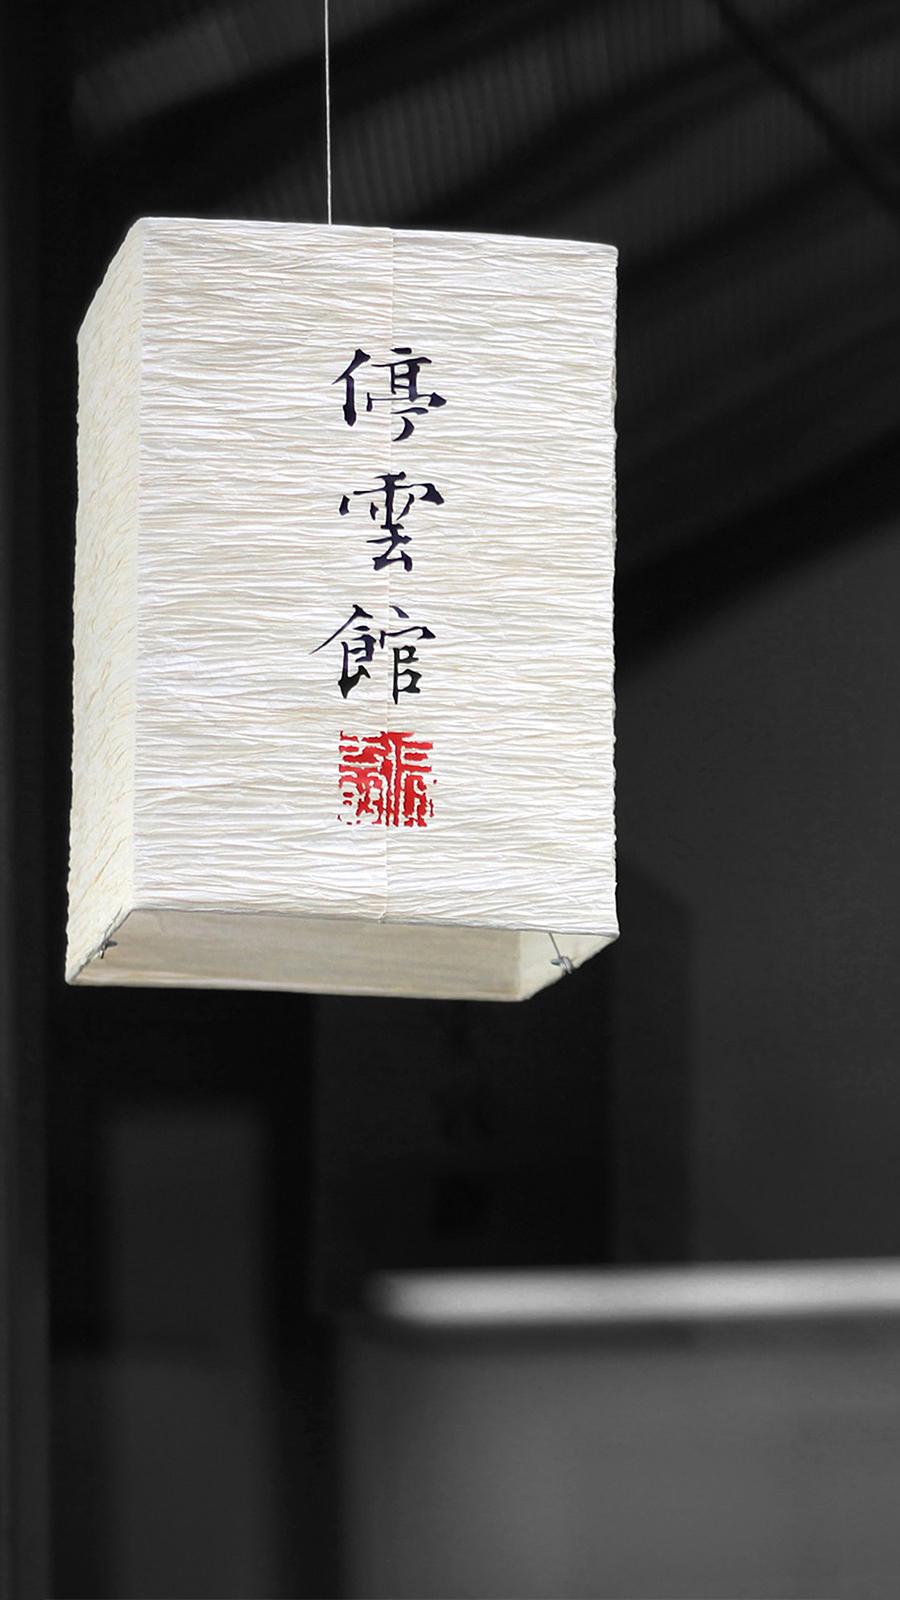 Asian Street Light Macro Wallpapers Free Download